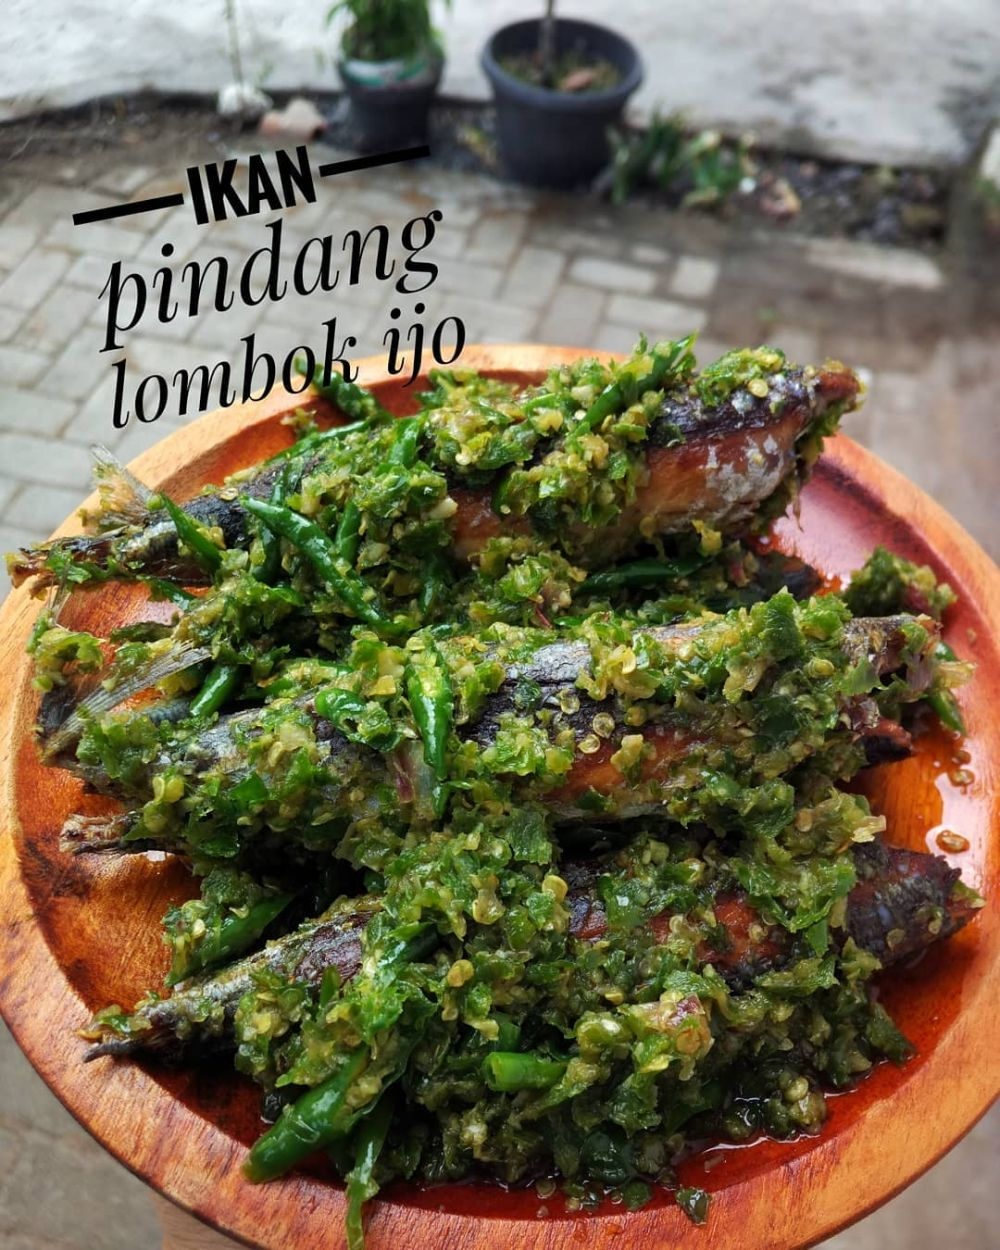 resep lombok ijo © 2020 brilio.net Instagram/@palakafarms ; Instagram/@iindapur